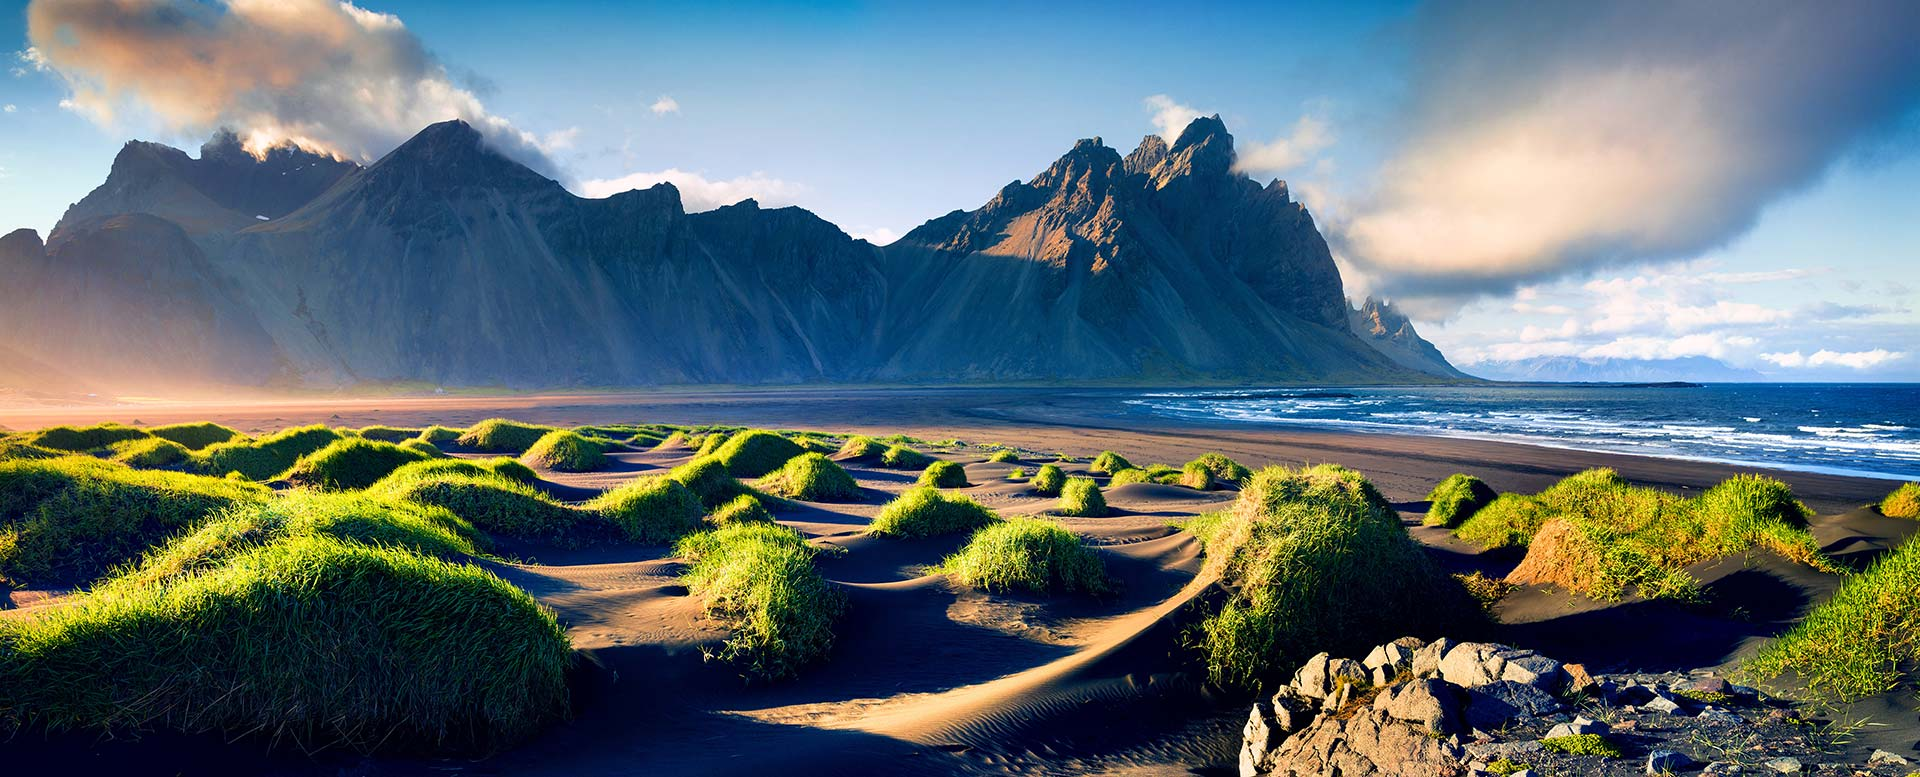 Flitterwochen-Ziel Island